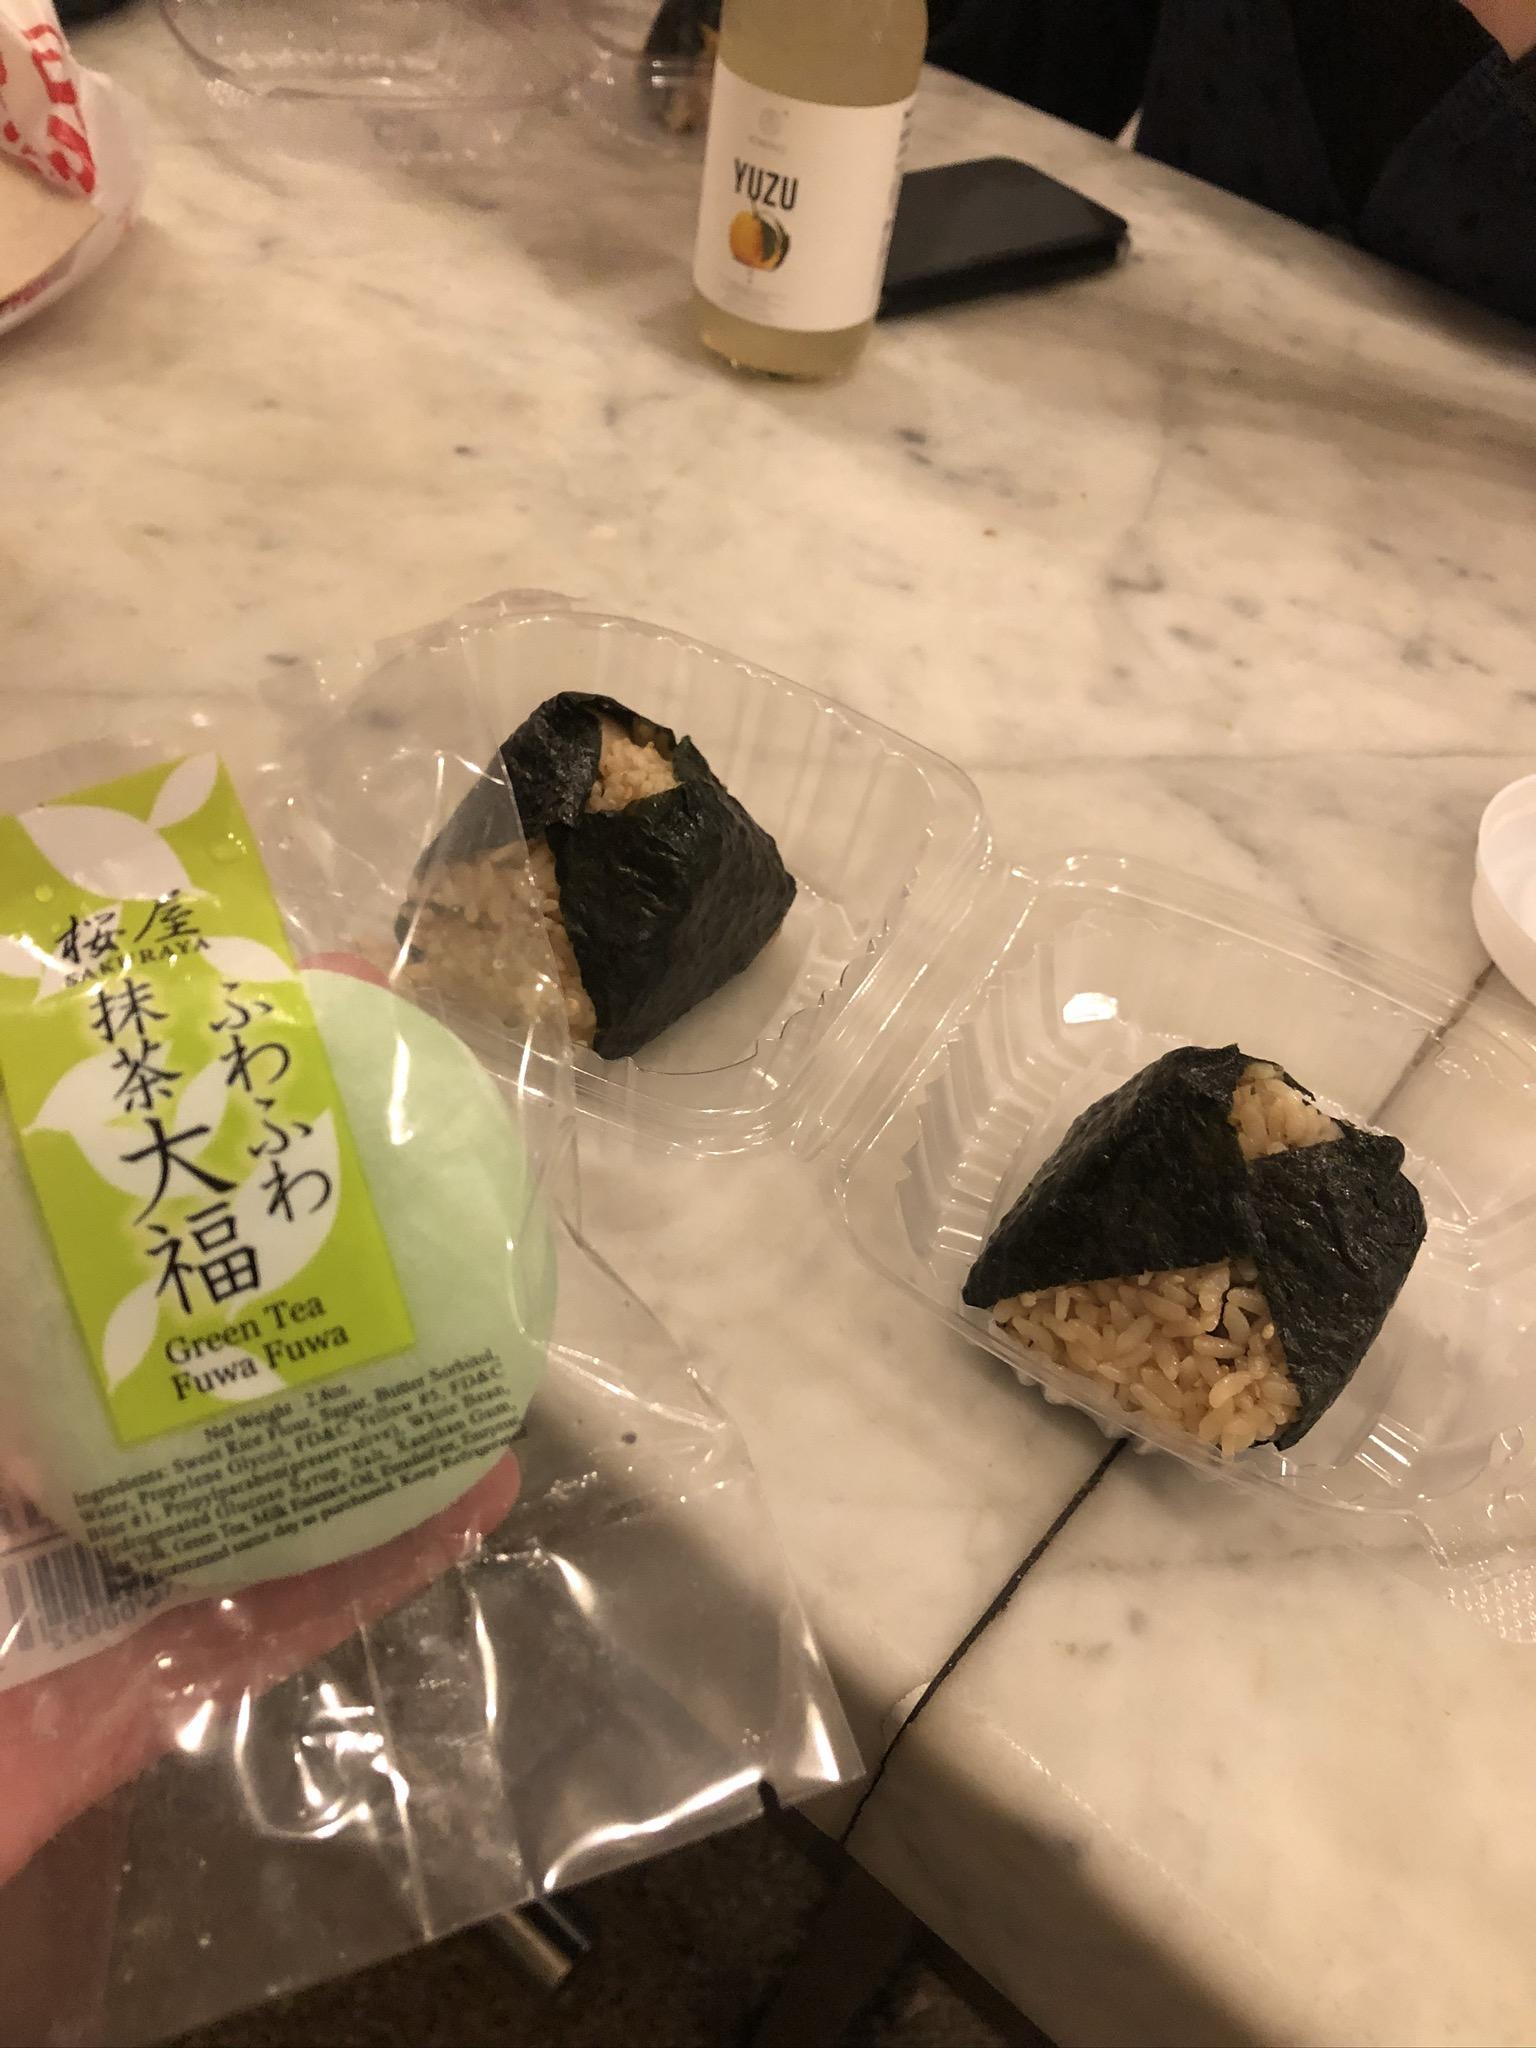 onigiri and matcha daifuku in wrapping